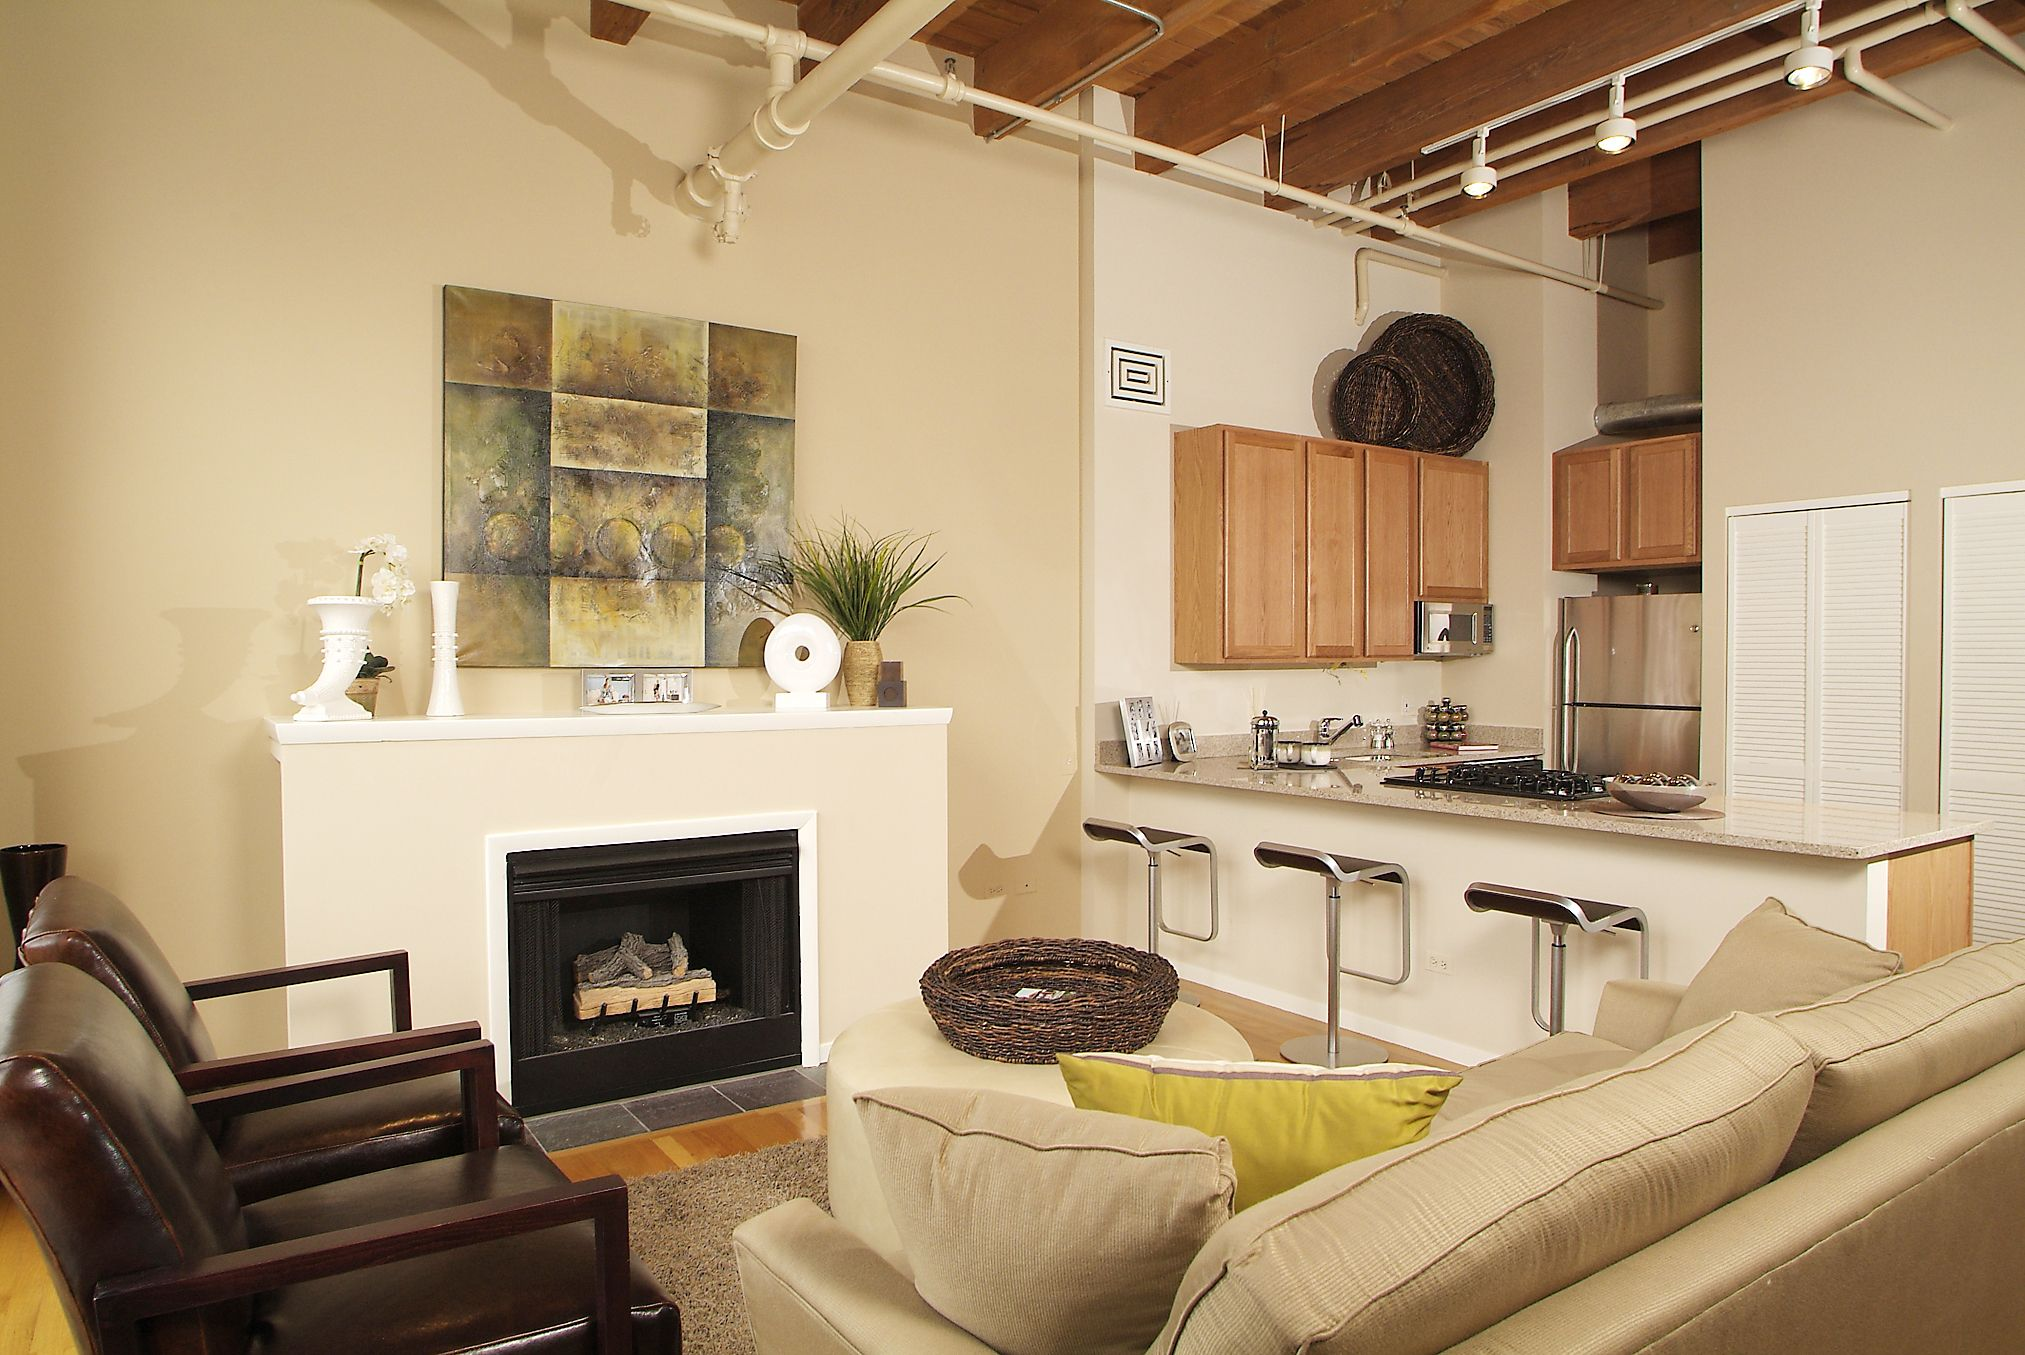 Pin By Jo Tuccio On Living Room Inspiration Condo Design Condominium Design Loft Apartment